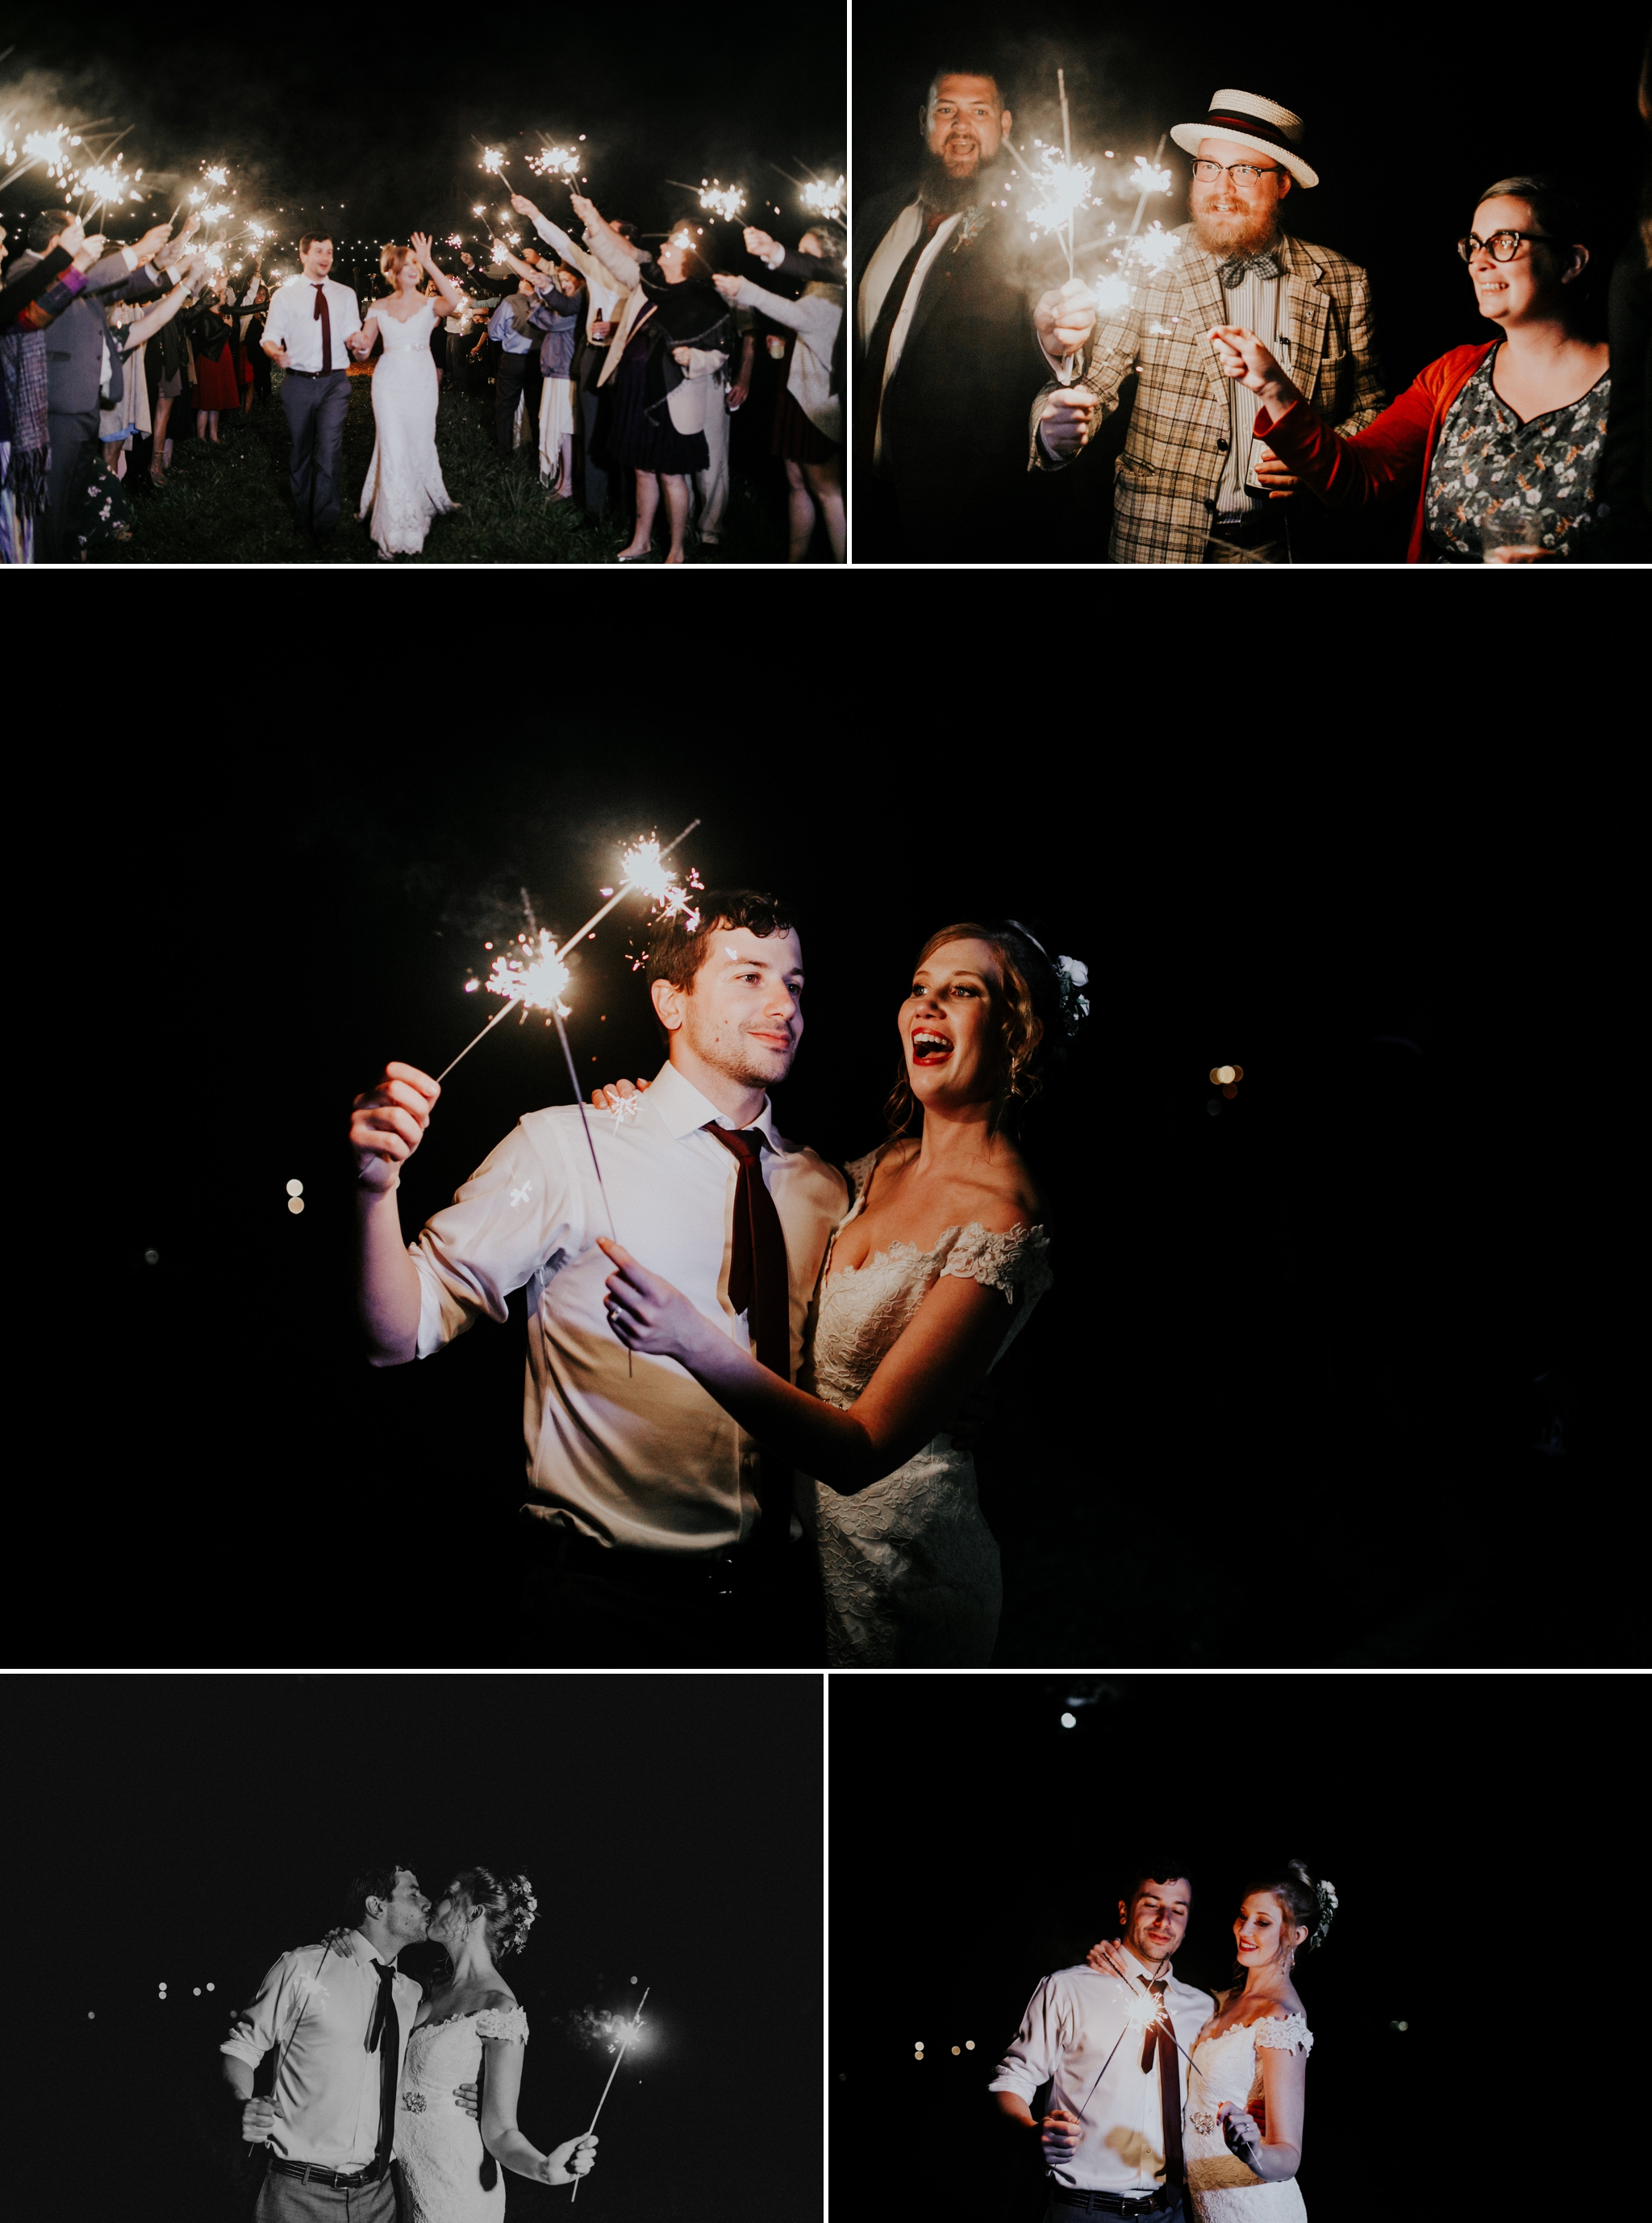 tahoe-wedding-photographer28.jpg